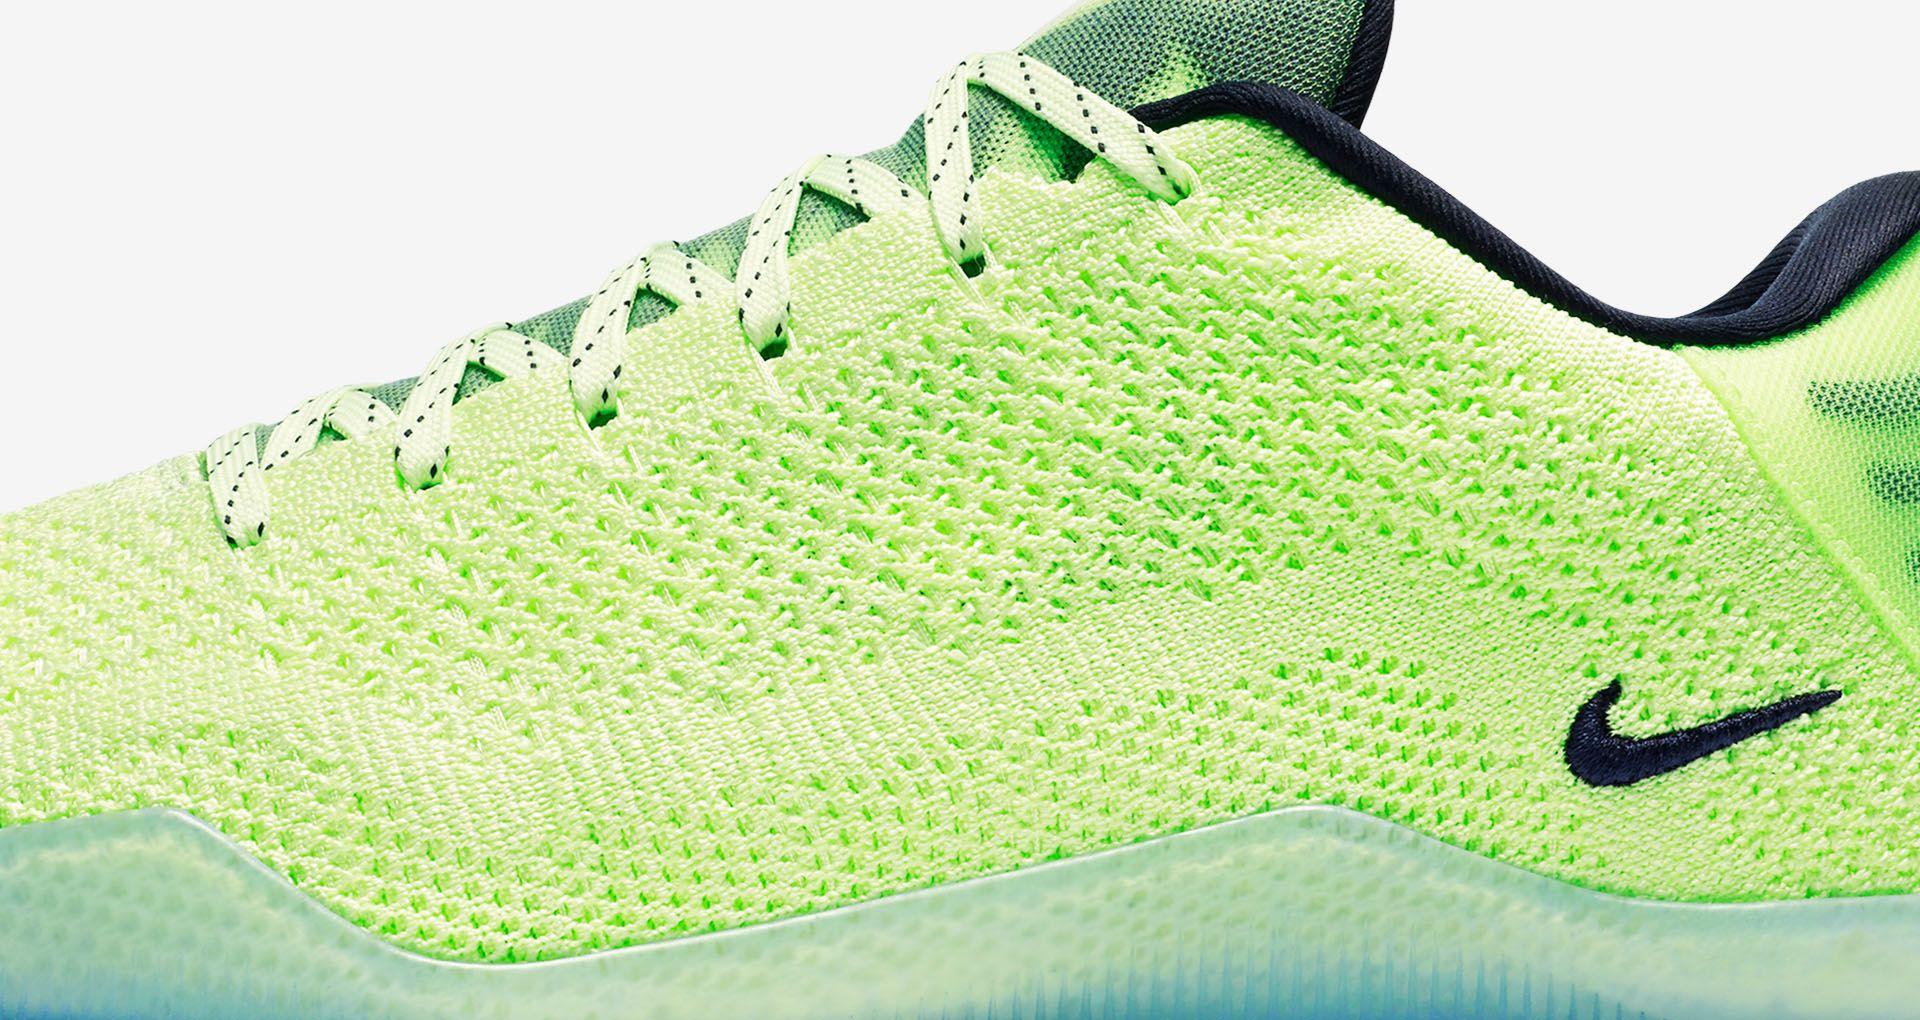 c664aefef7f1 Nike Kobe 11 Elite Low 4KB  Liquid Lime . Nike+ SNKRS